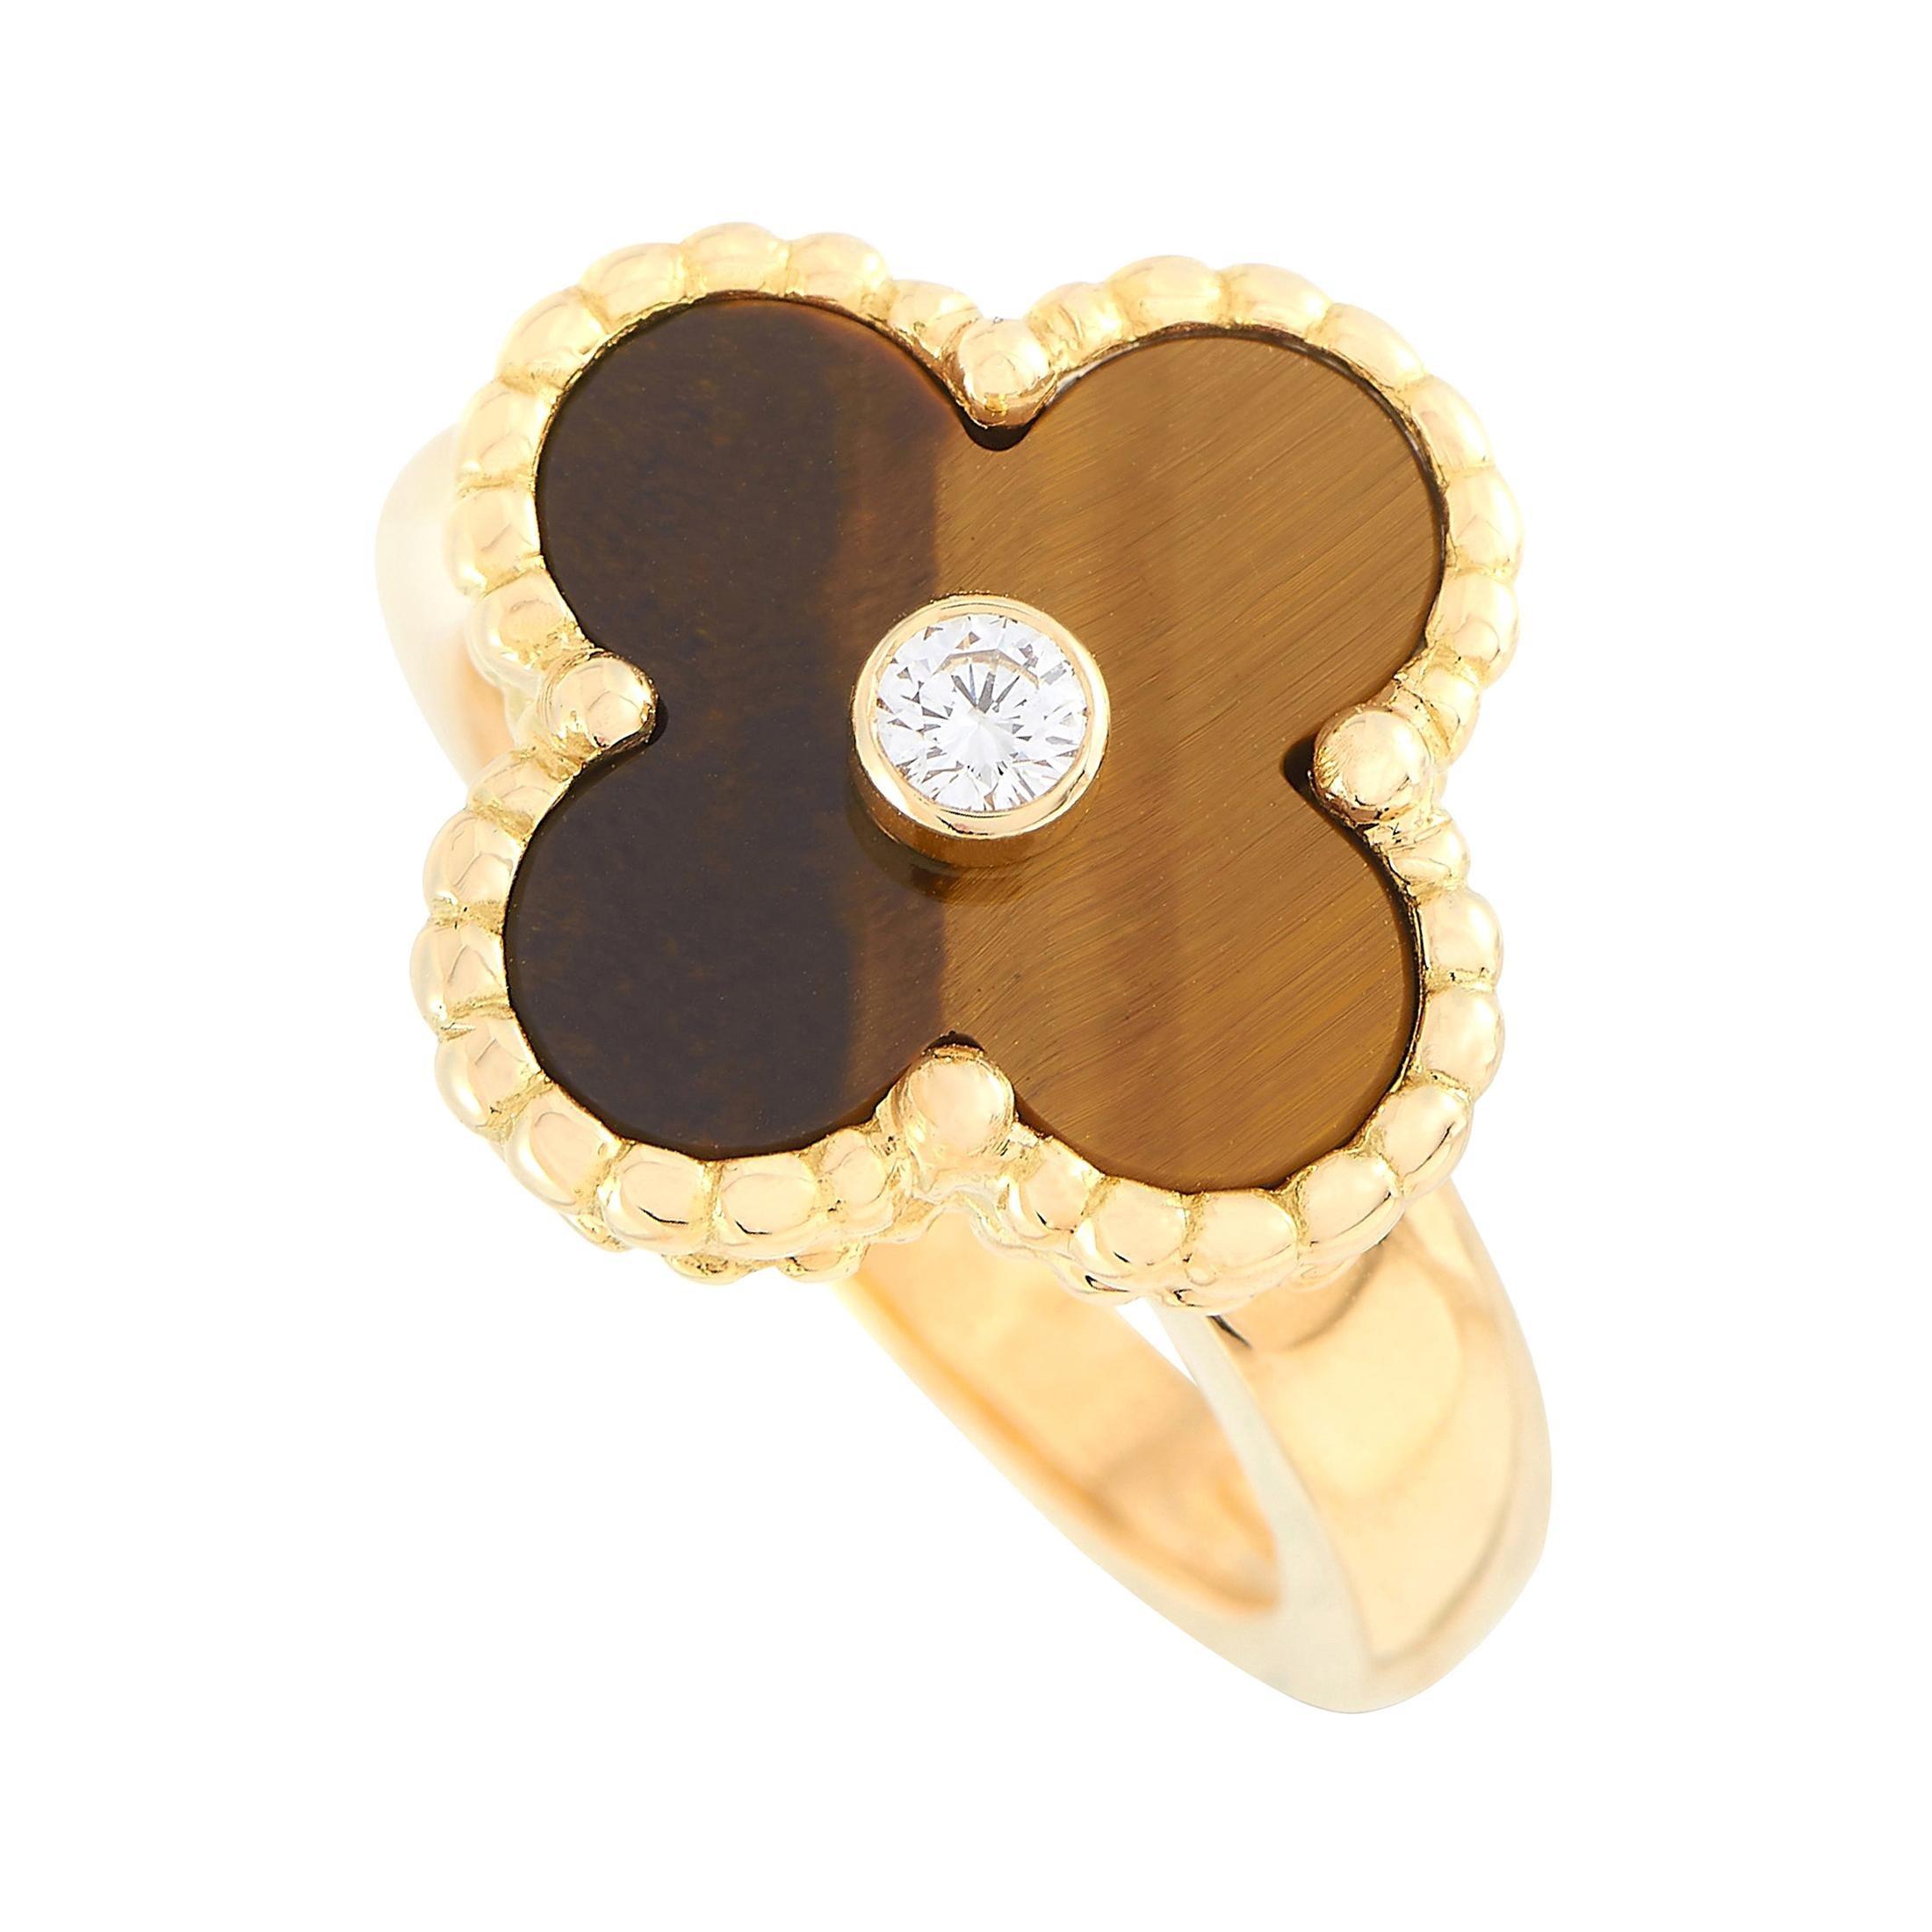 Van Cleef & Arpels Vintage Alhambra 18K Yellow Gold Diamond and Tiger Eye Ring